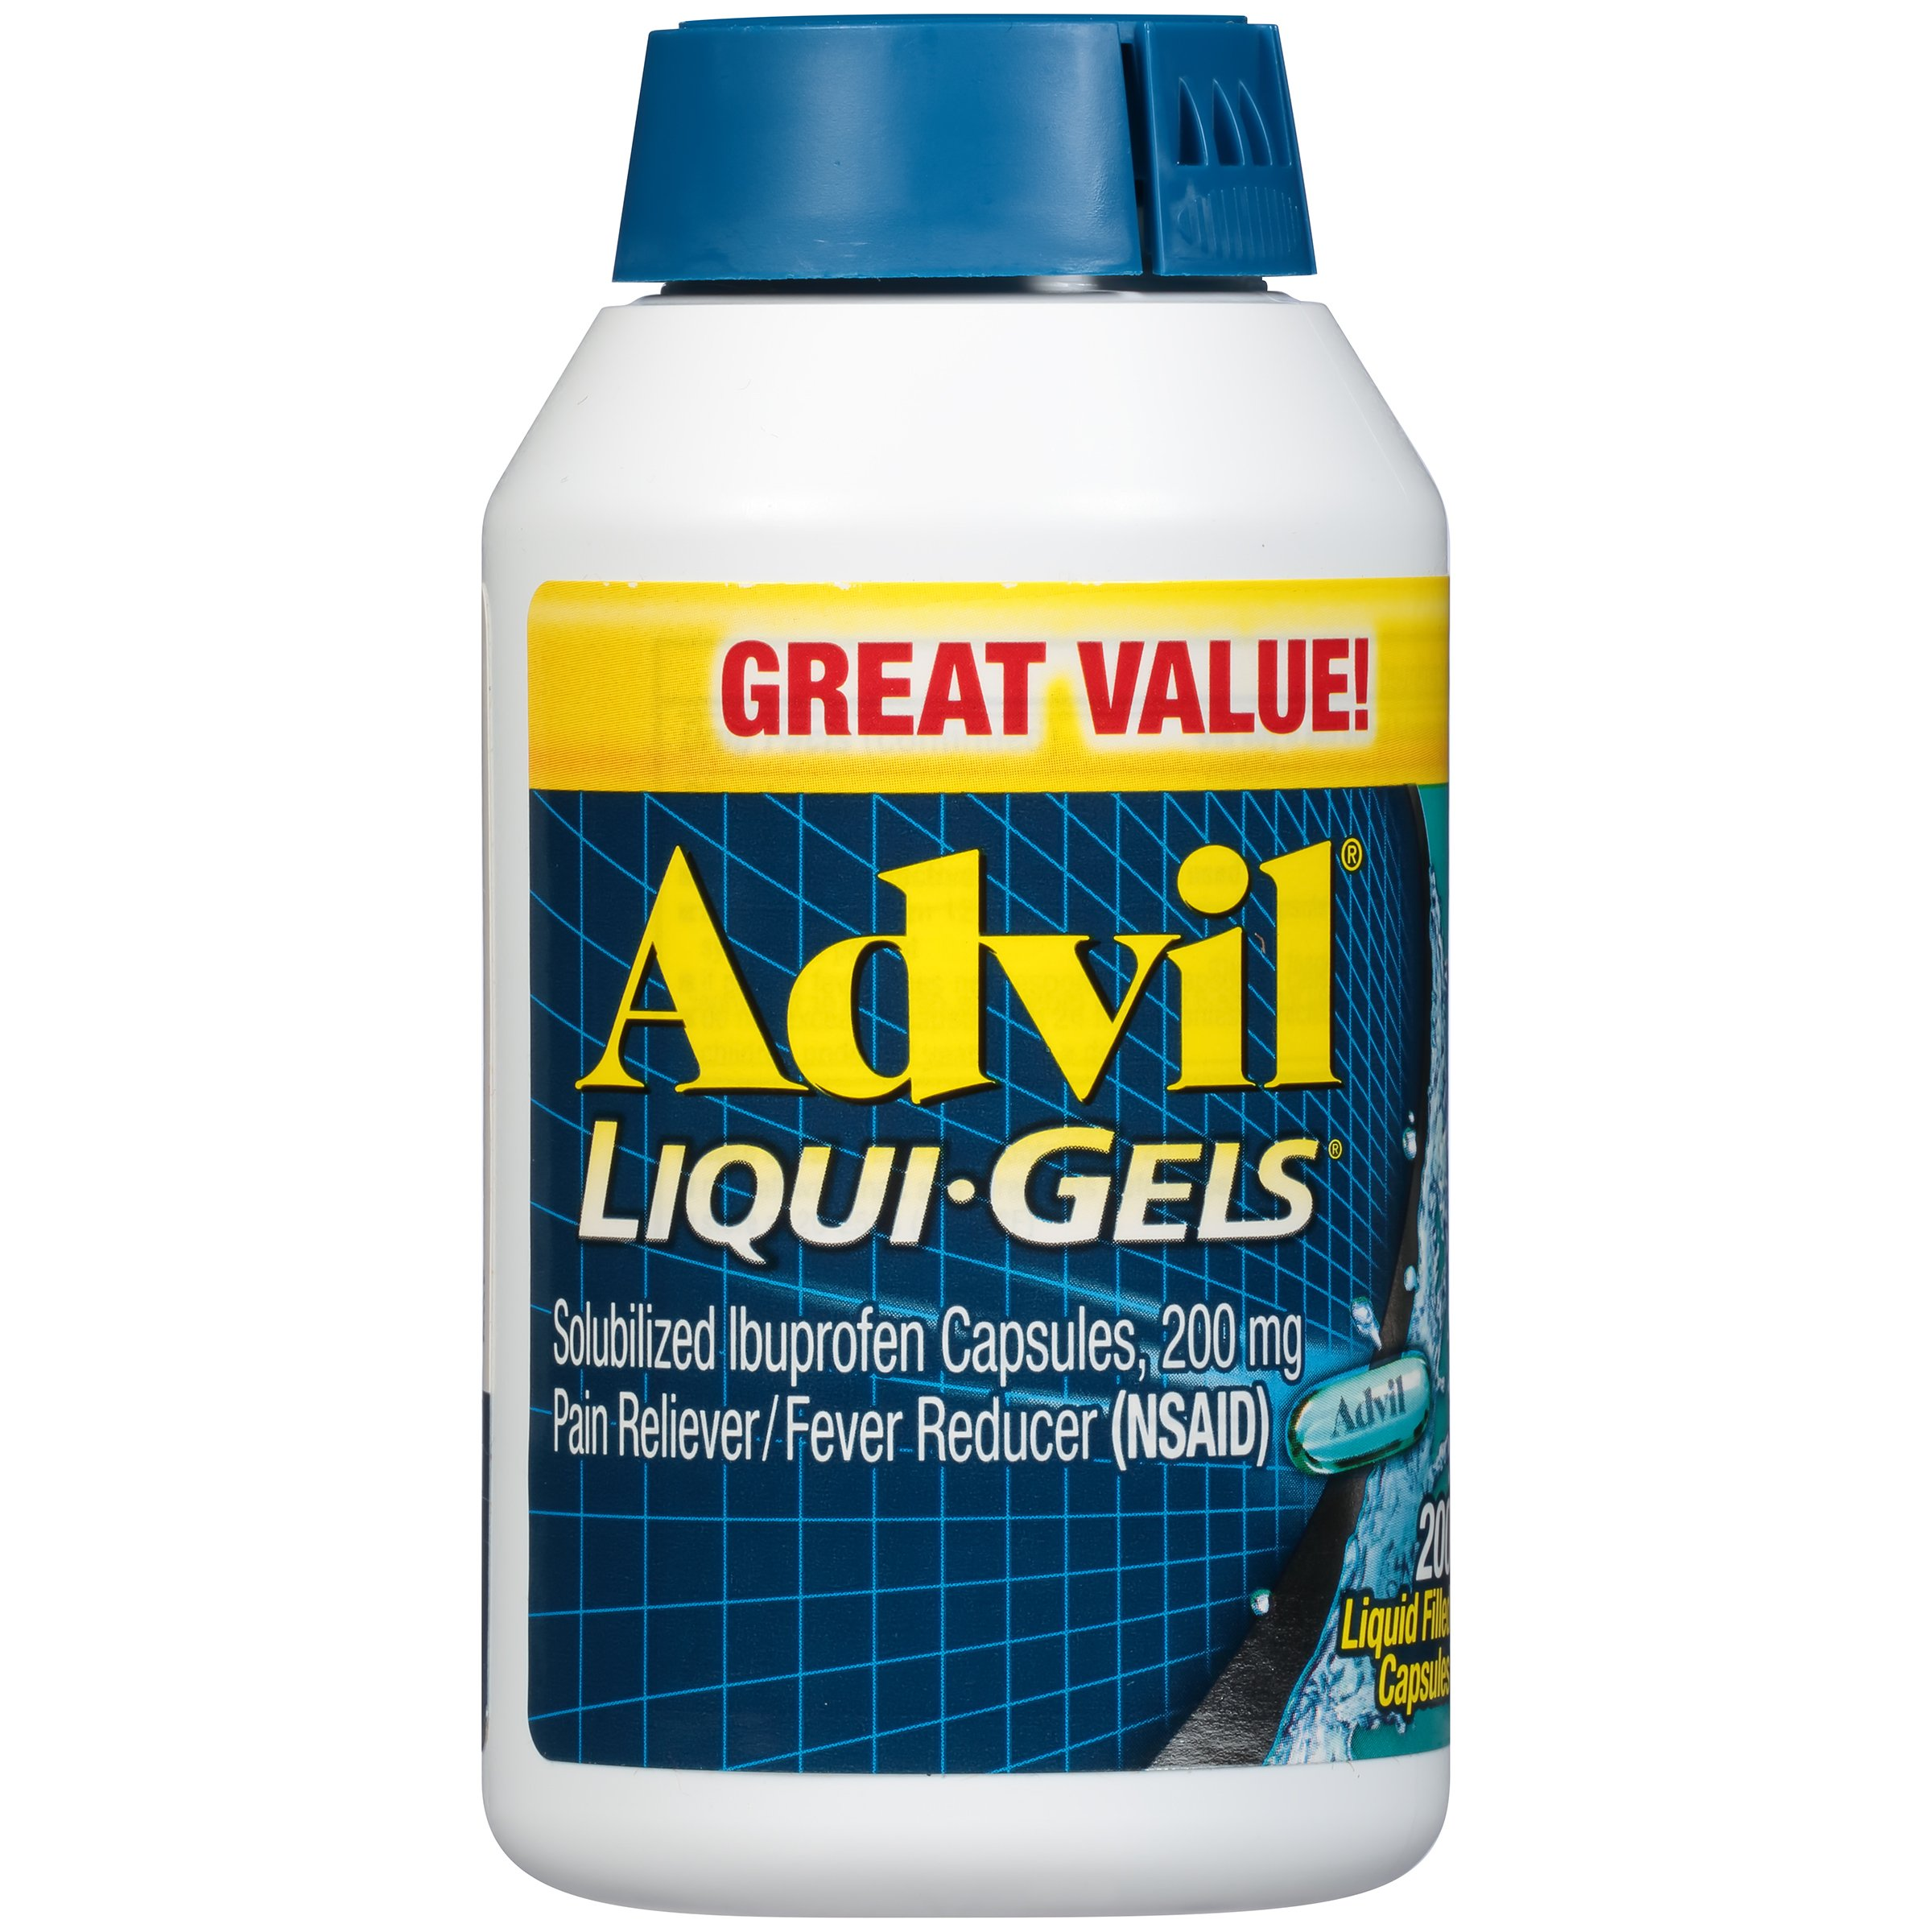 Advil Liqui-Gels (200 Count) Pain Reliever/Fever Reducer Liquid Filled Capsule, 200mg Ibuprofen, Temporary Pain Relief